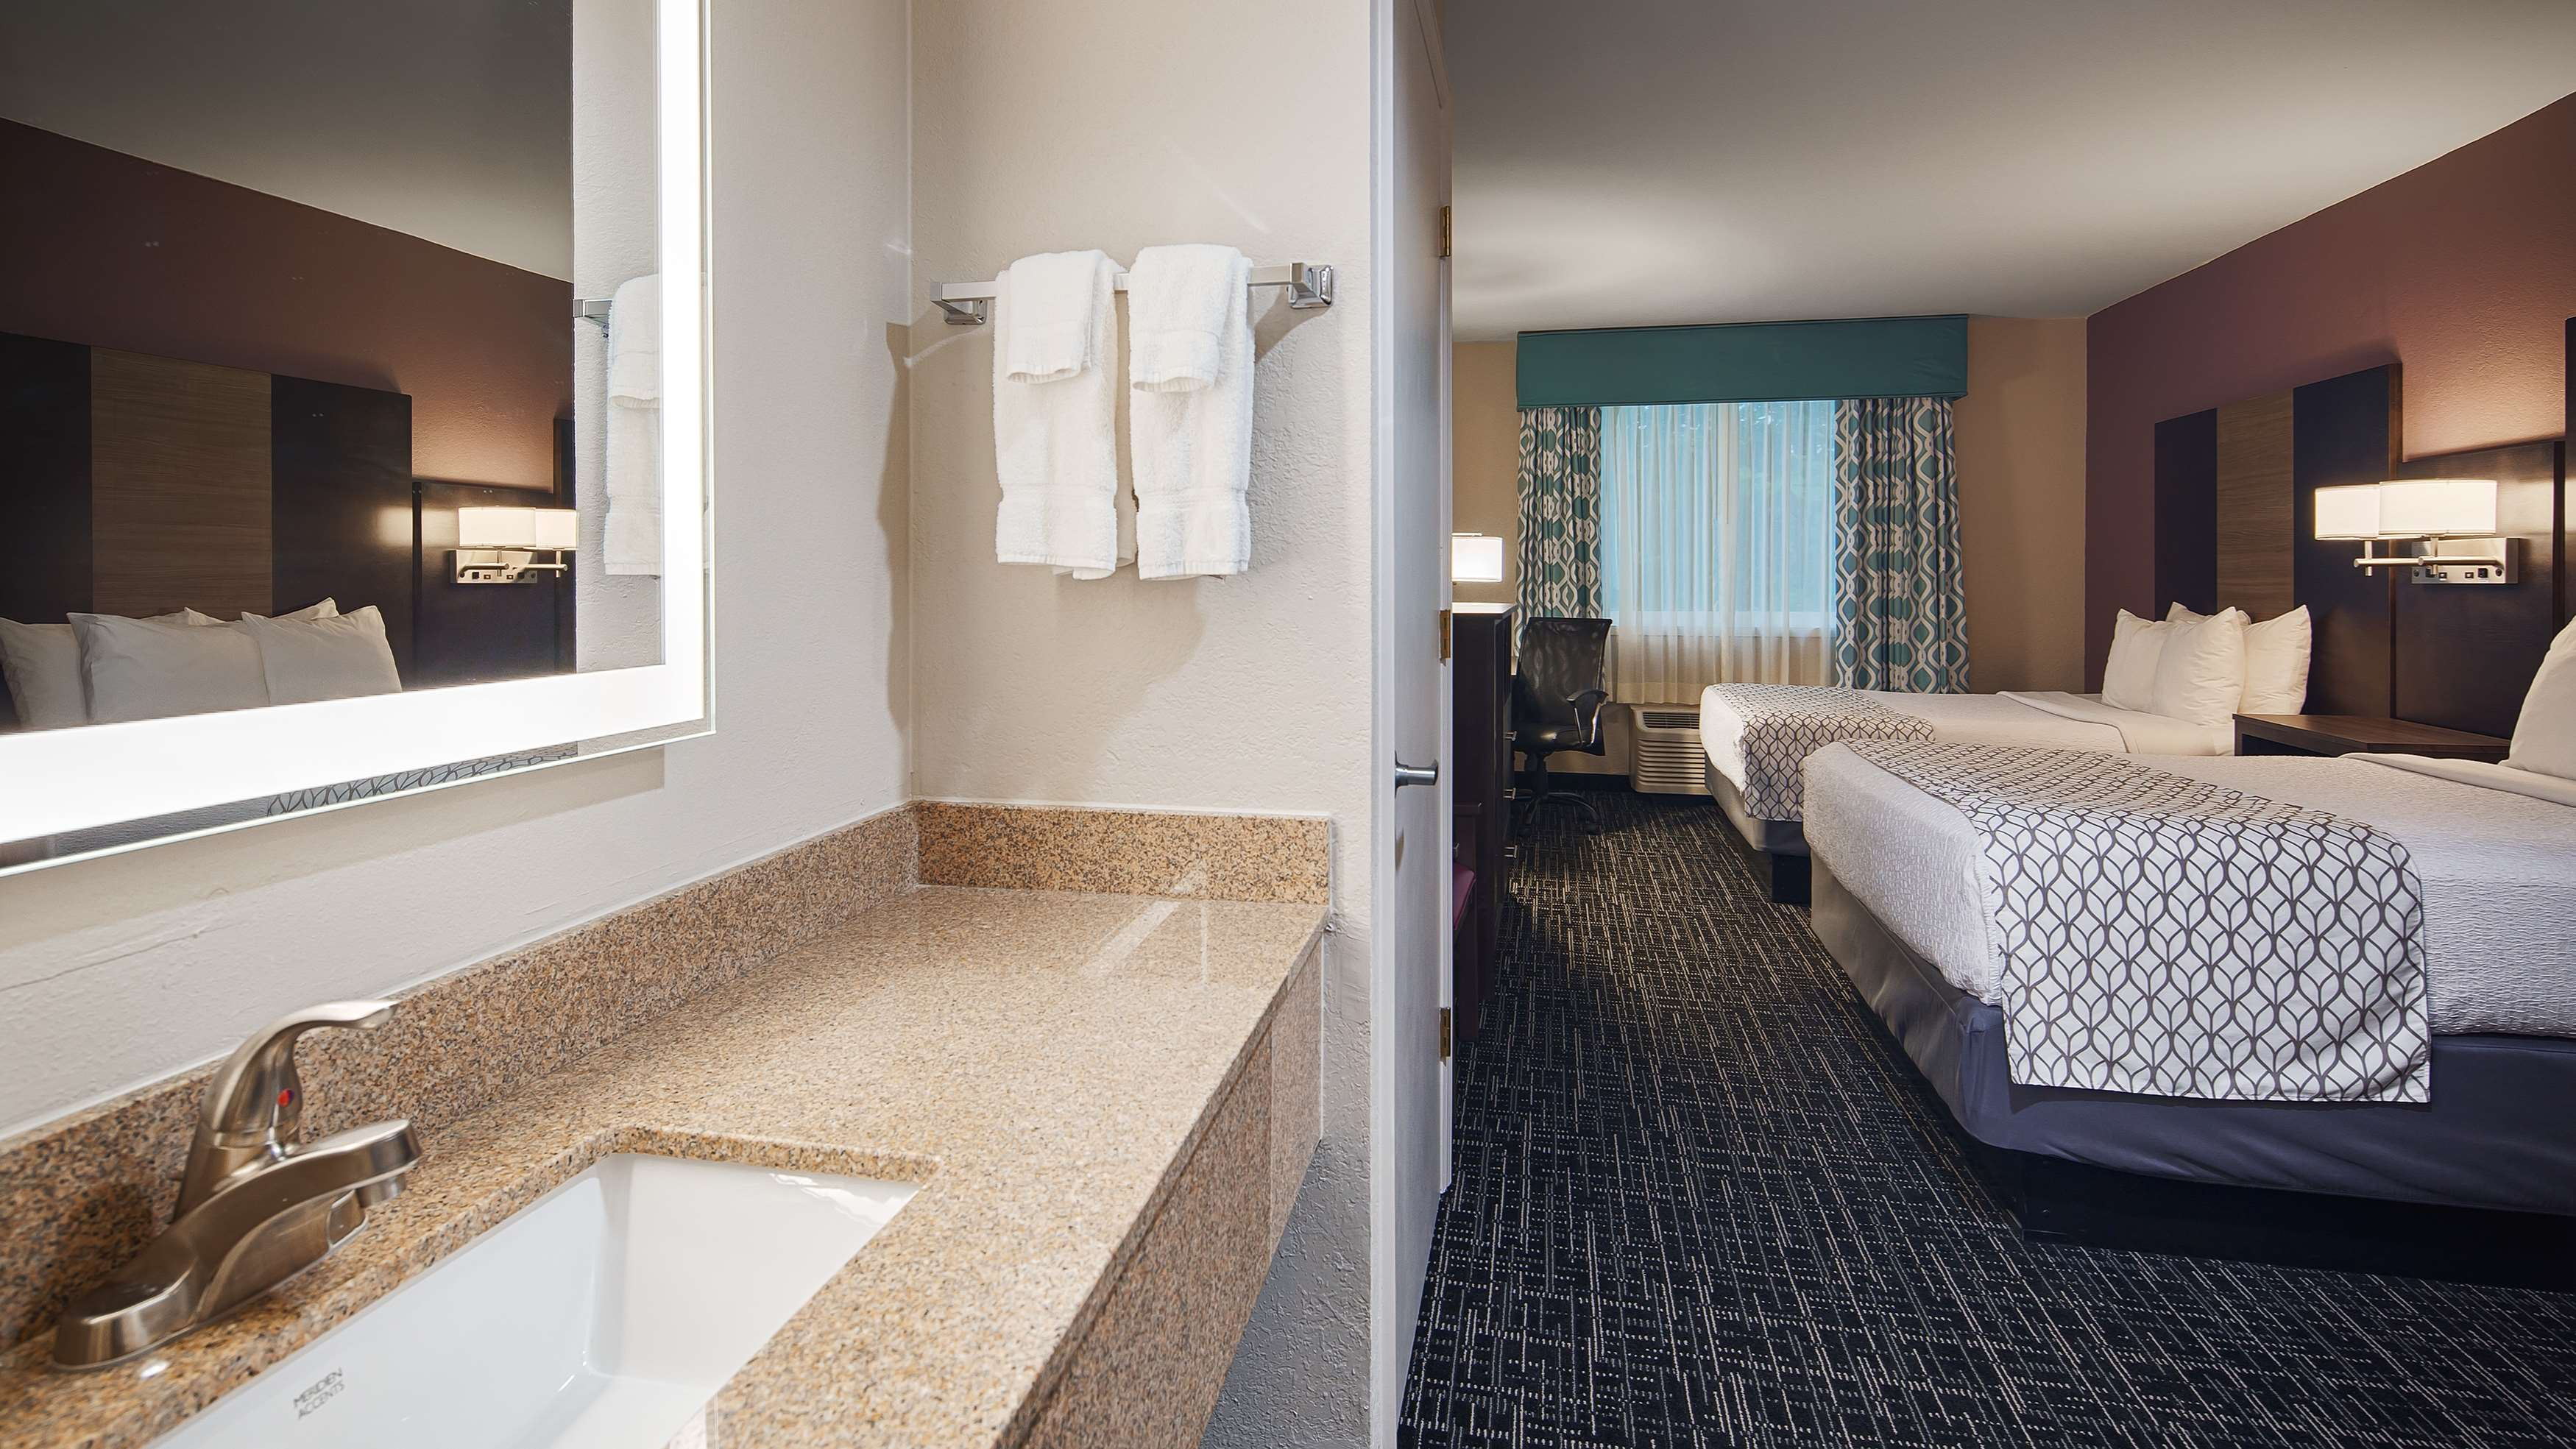 Best Western Fort Myers Inn & Suites image 14